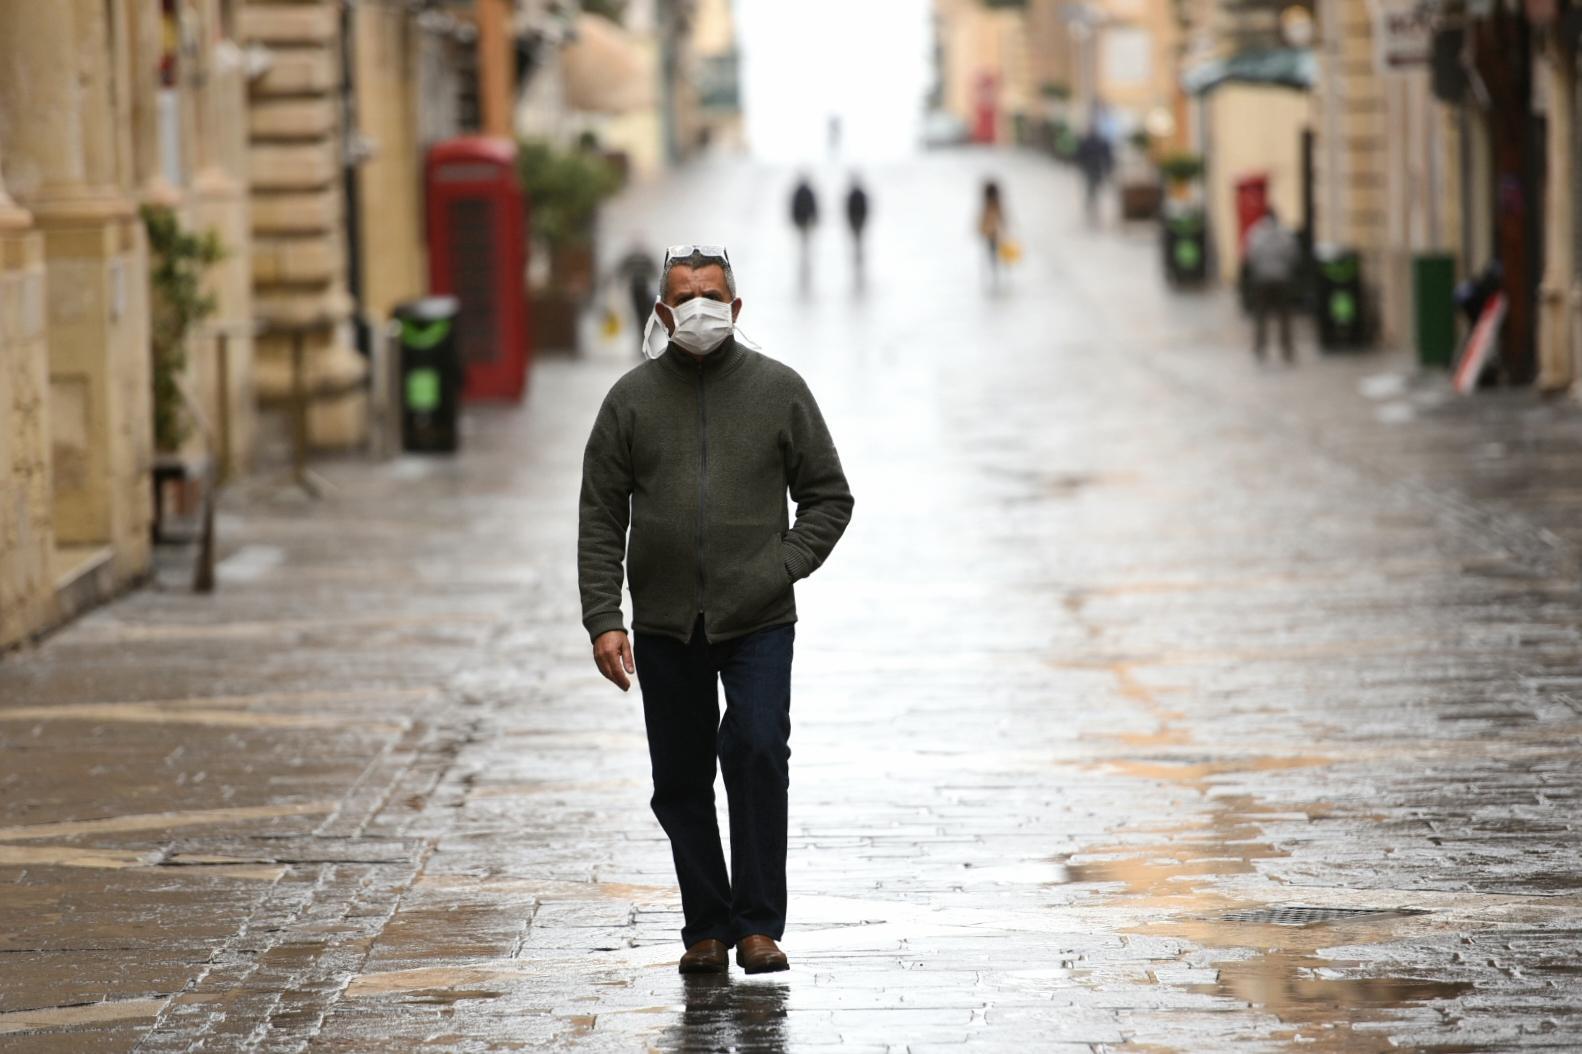 Republic Street in Valletta on Wednesday. Photo: Chris Sant Fournier